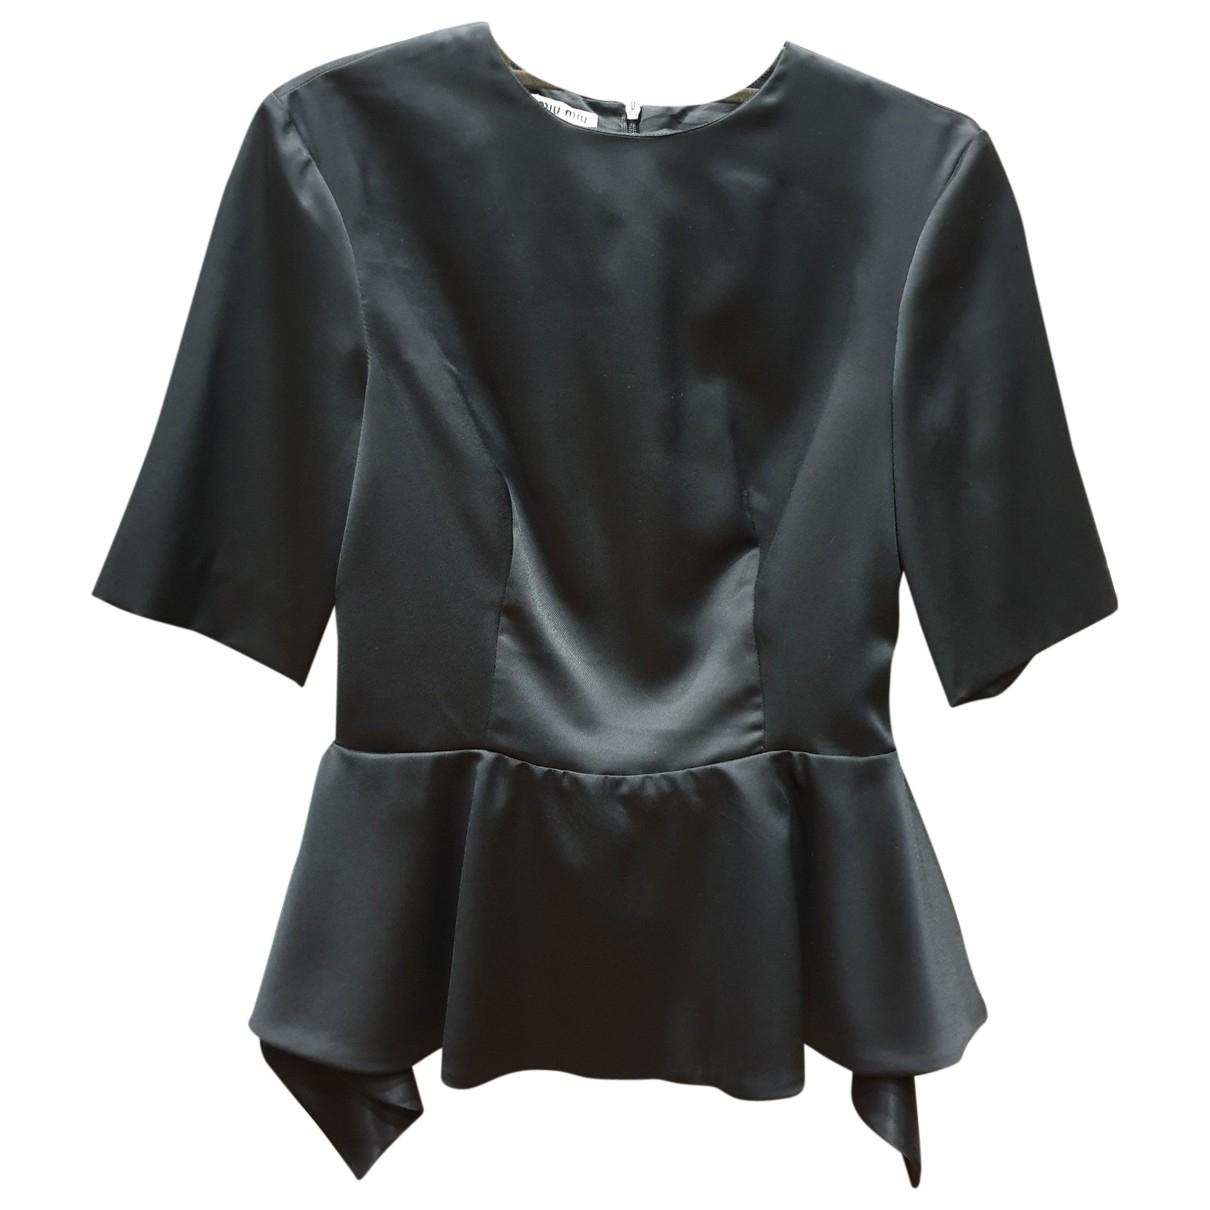 Miu Miu \N Black  top for Women 36 IT